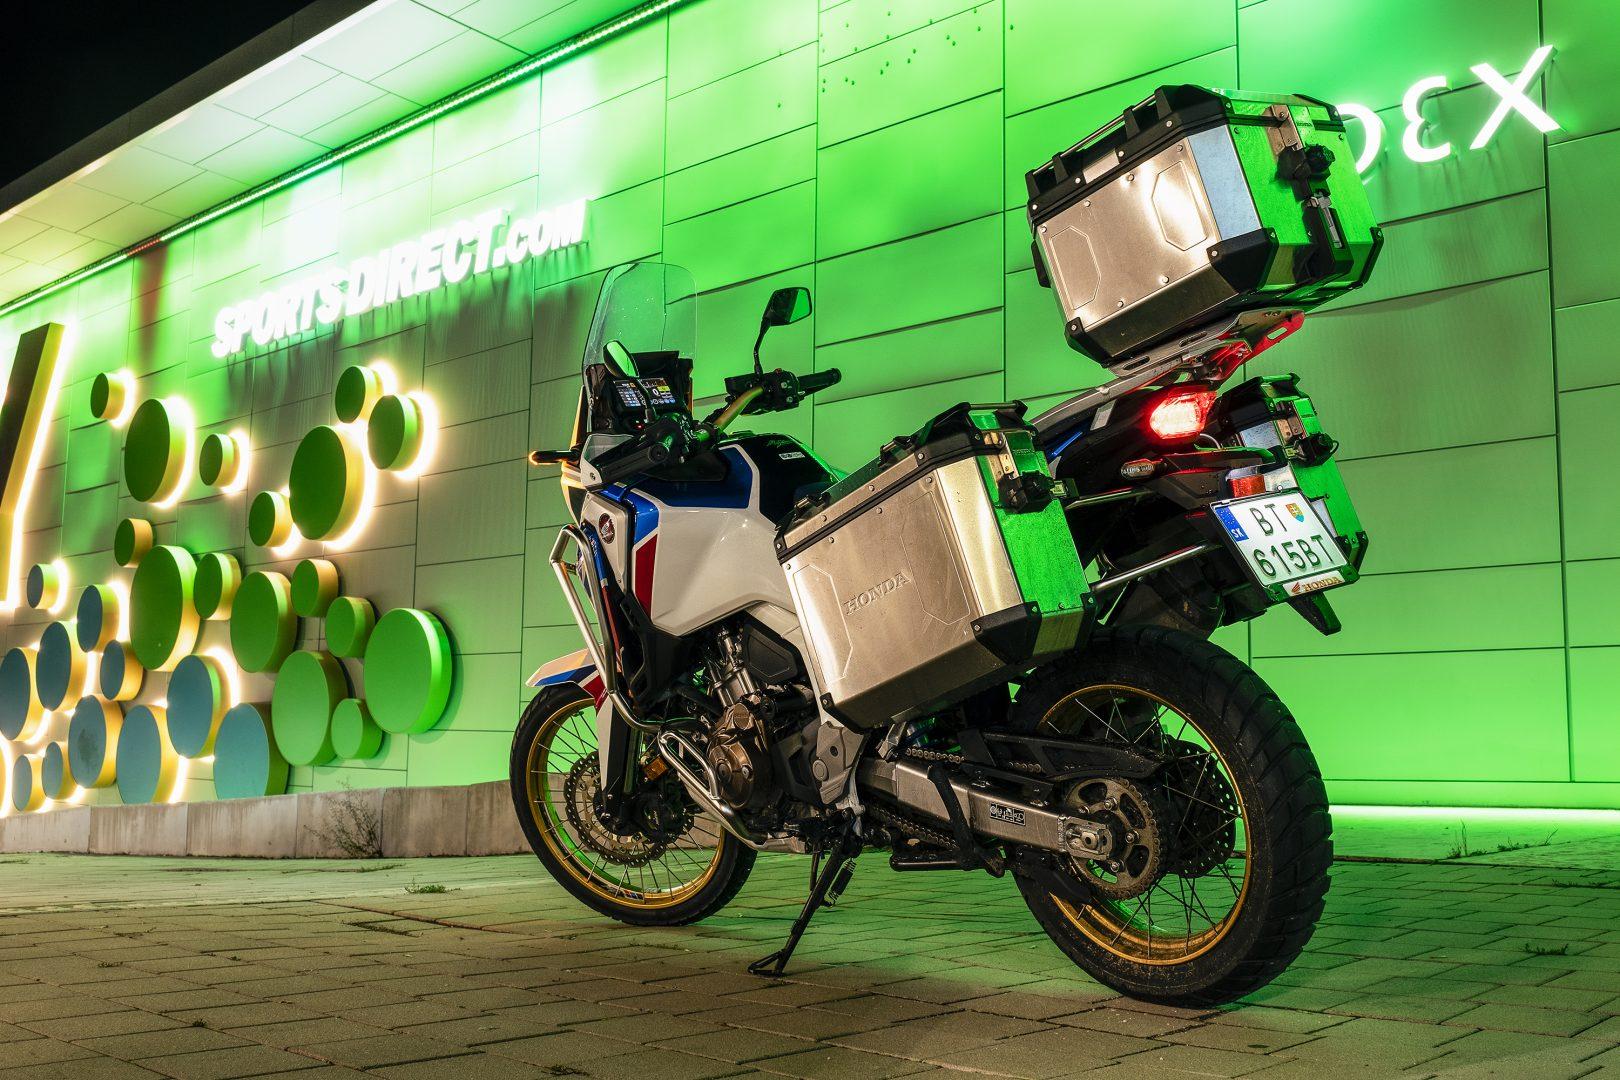 honda africa twin model adventure sports 2020 test recenze recenzia Moto motocyklov turistika kufre